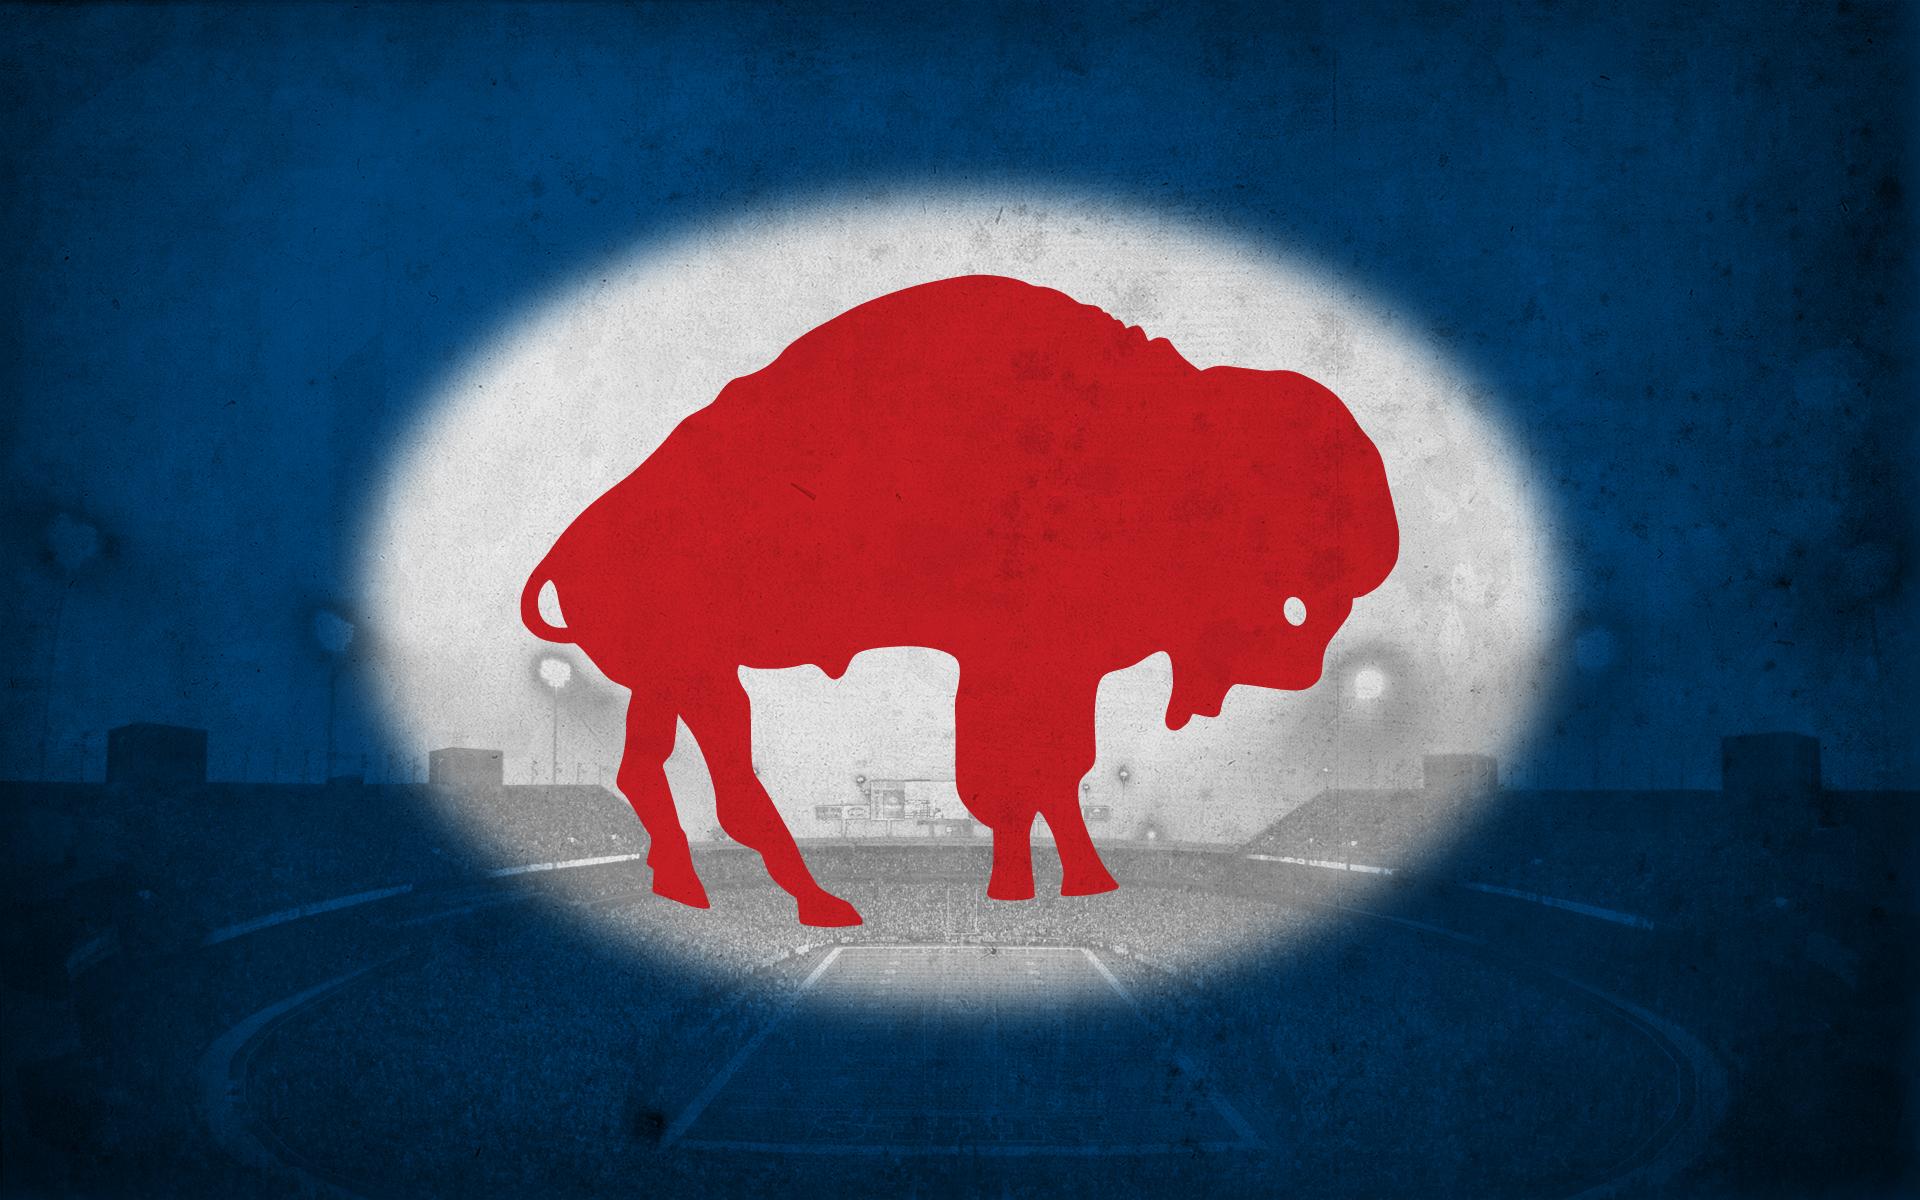 Buffalo Bills Desktop Wallpaper 1920x1200